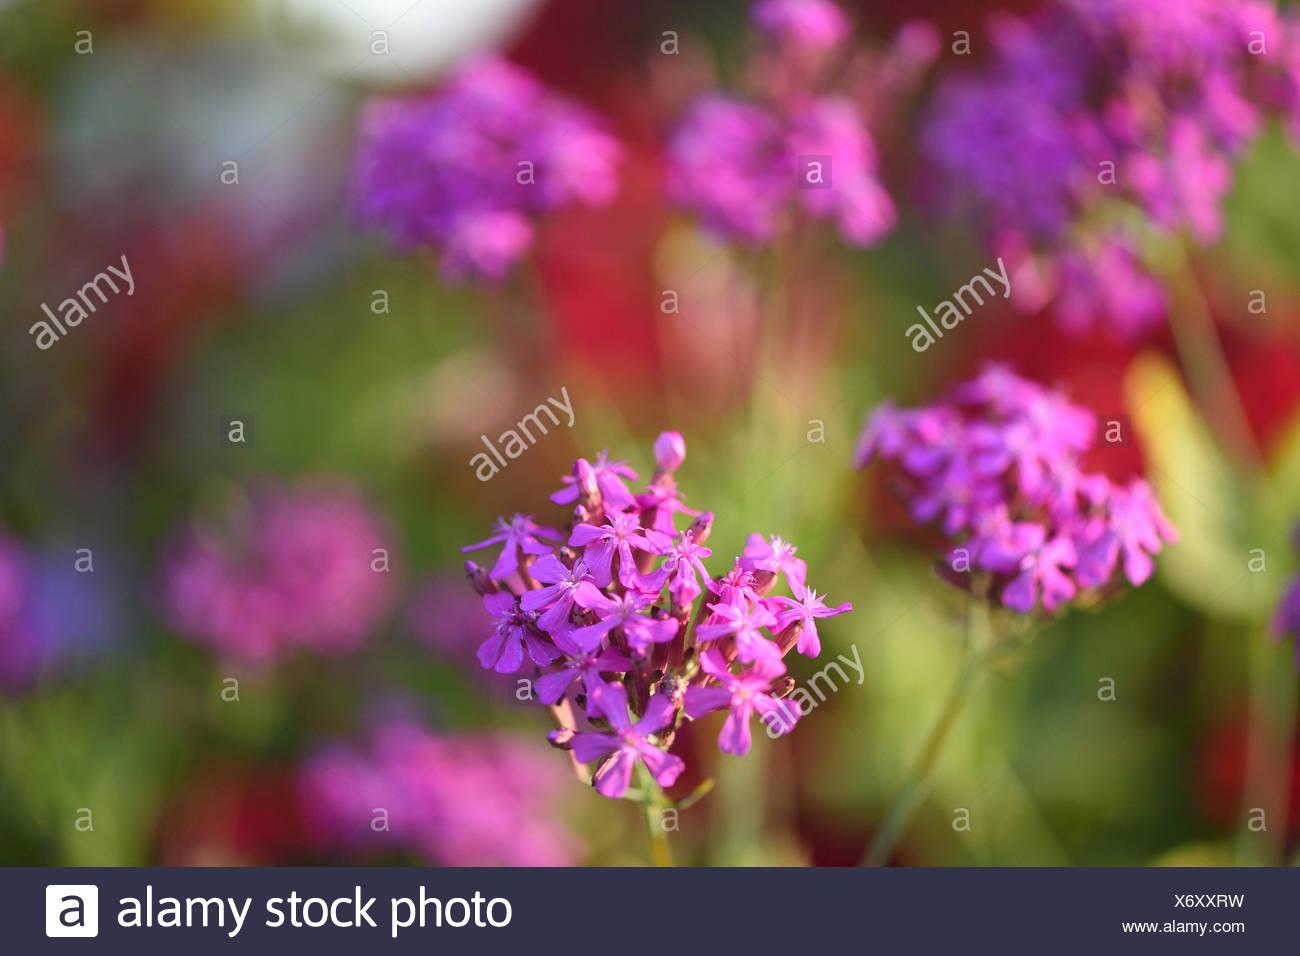 garden catchfly, sweet-william catchfly, thrift catchfly, none so pretty (Silene armeria), blooming - Stock Image